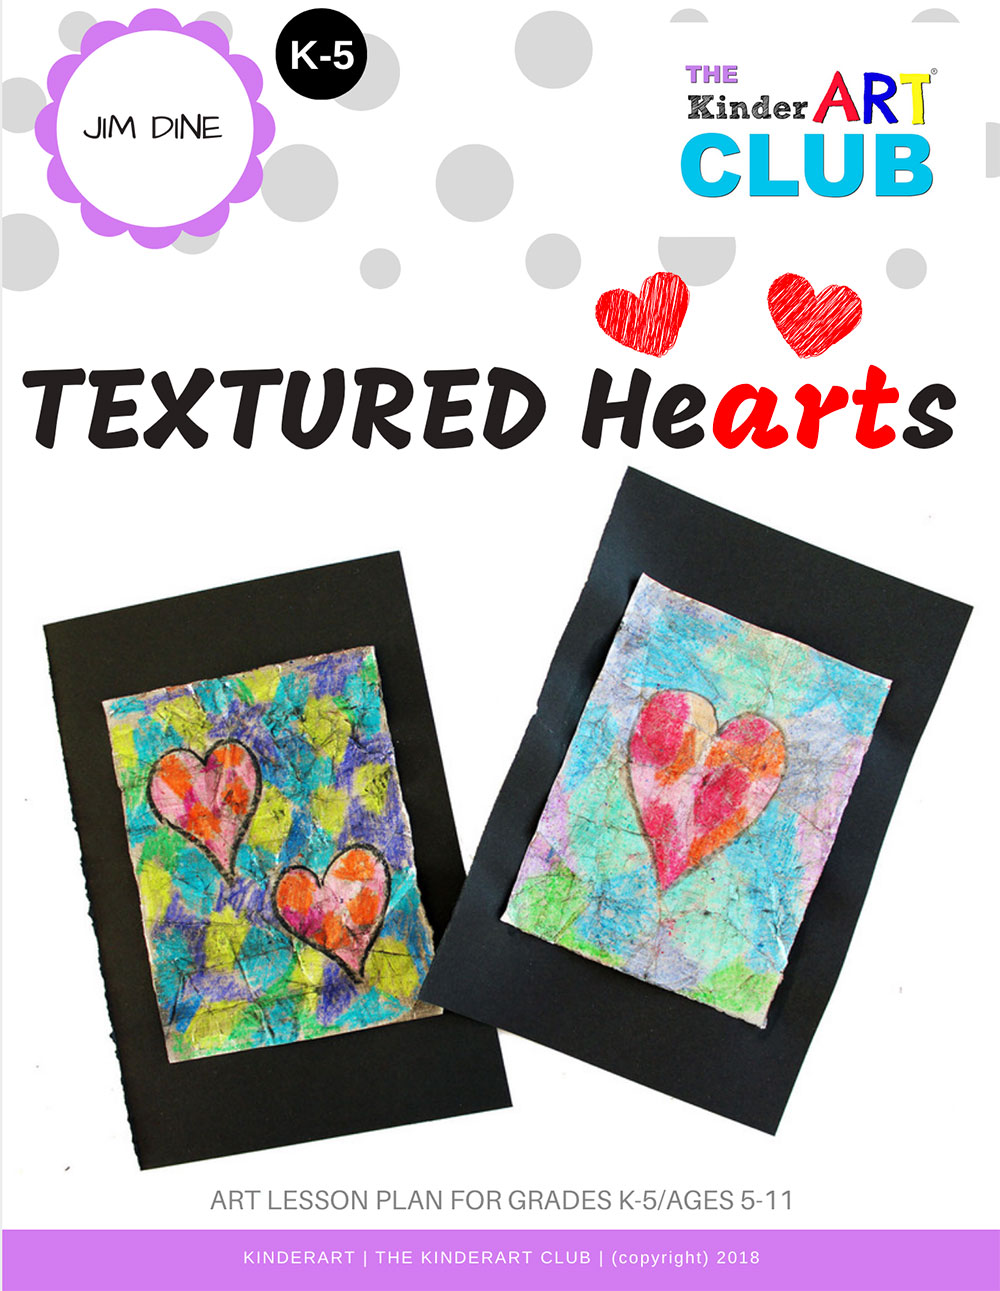 dine_textured_hearts